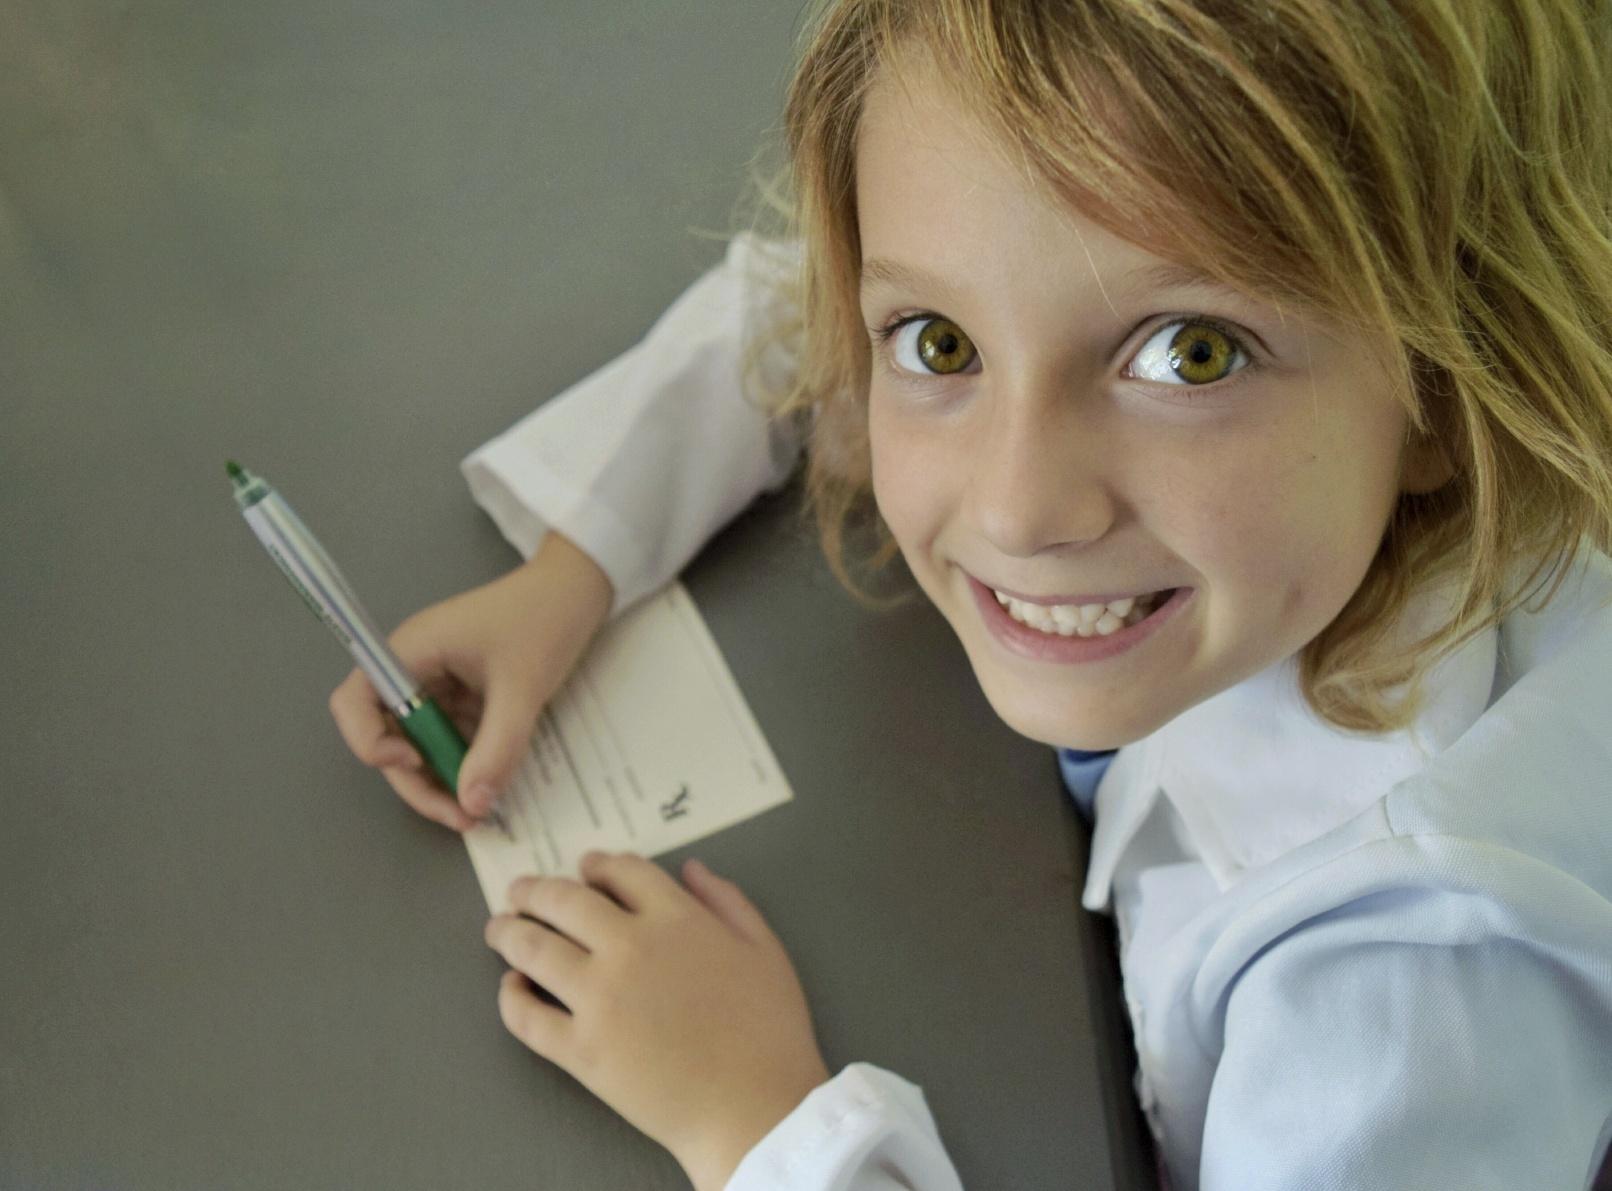 Girl writing and imagining